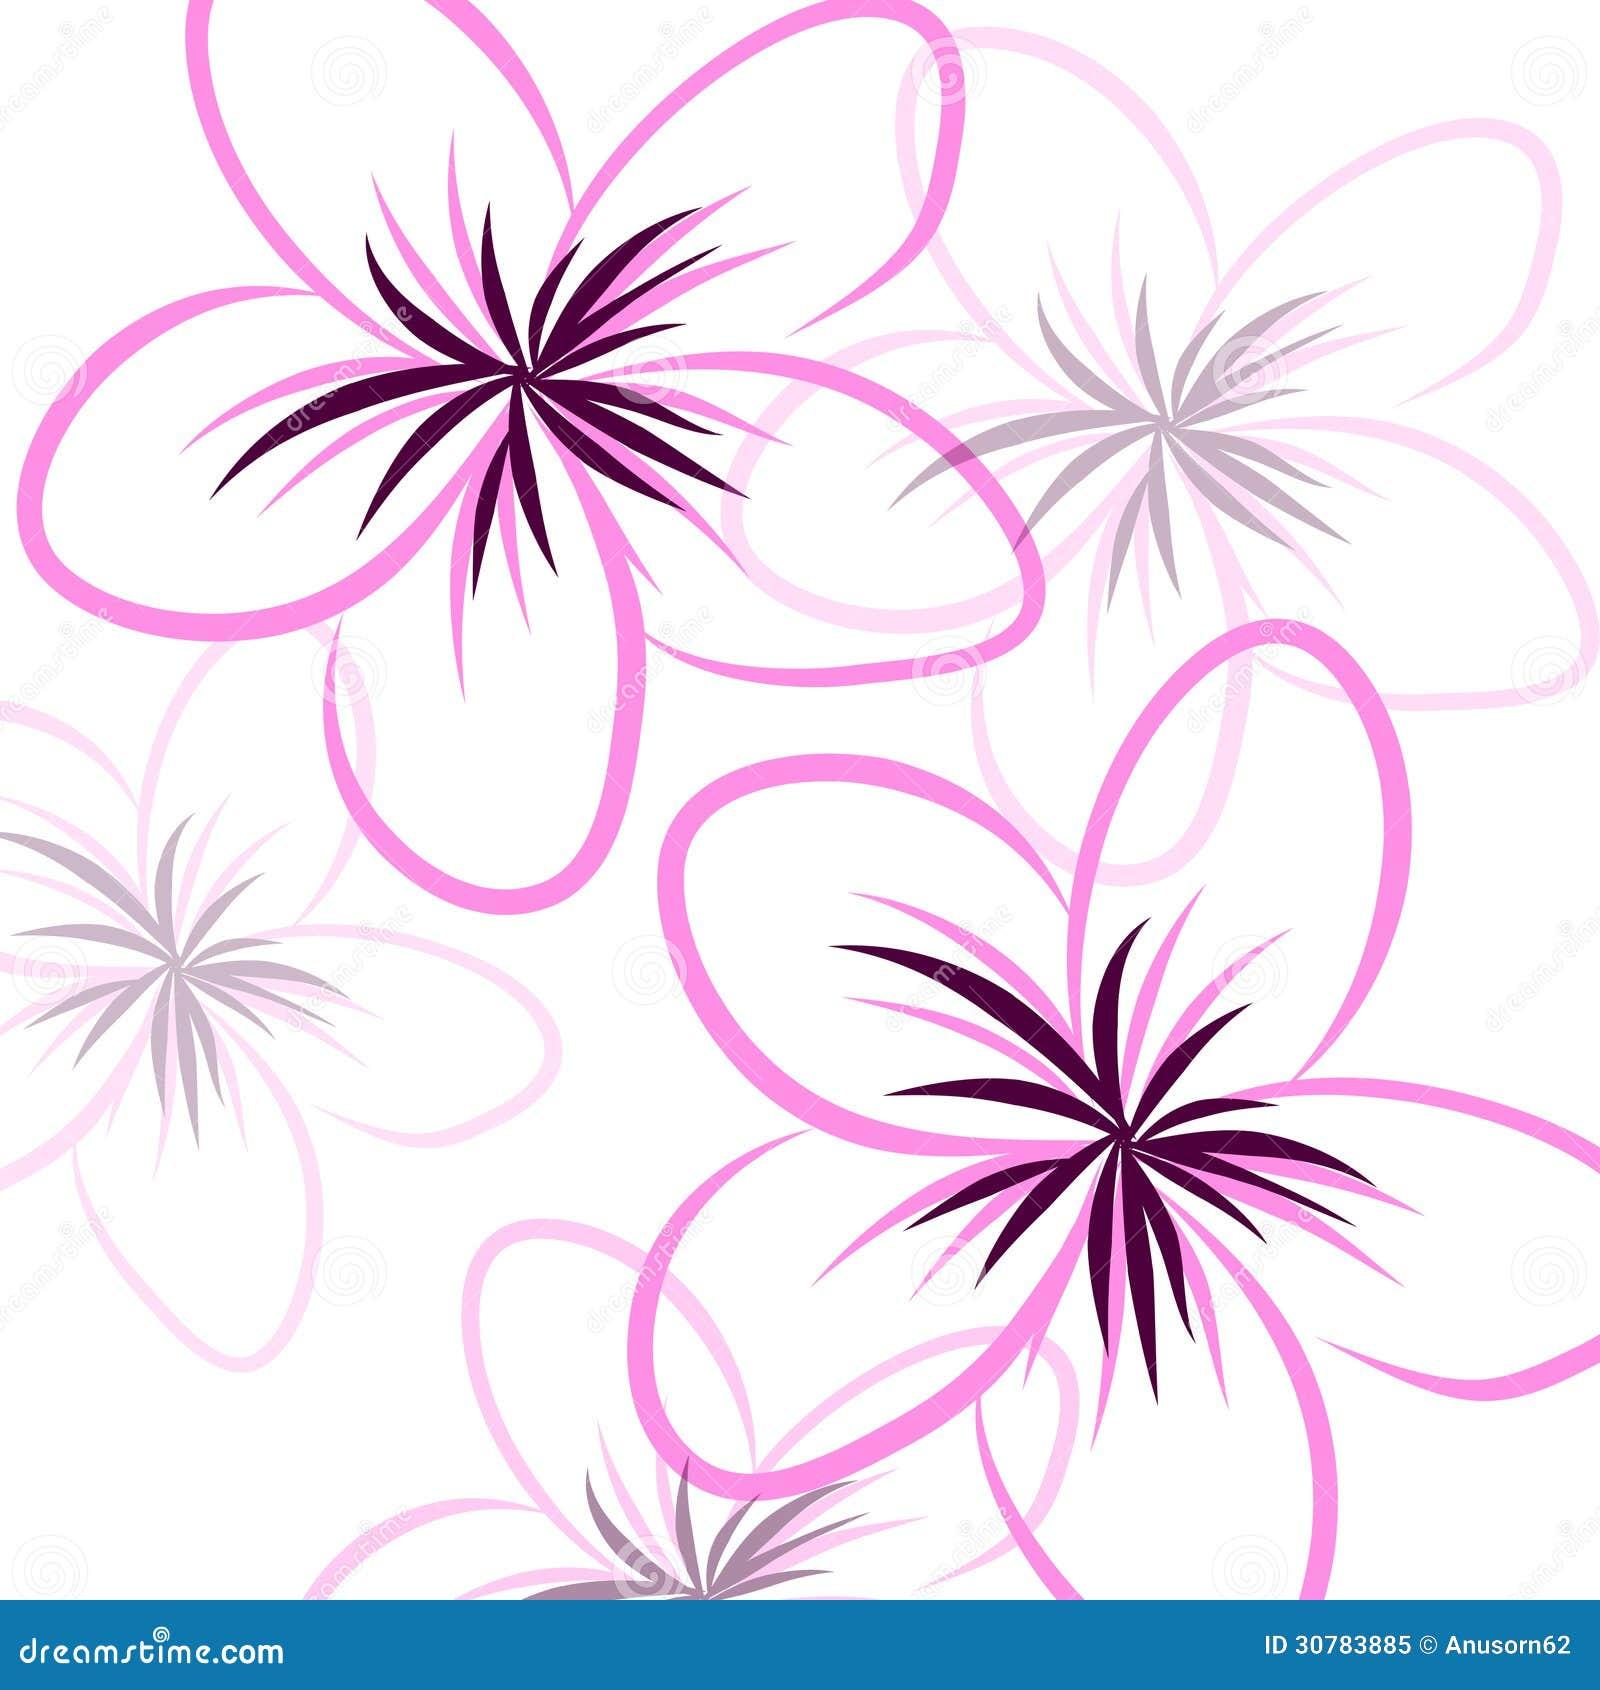 16 violet flower tattoo designs herbata z bratka domowe sposoby na pryszcze you can use. Black Bedroom Furniture Sets. Home Design Ideas